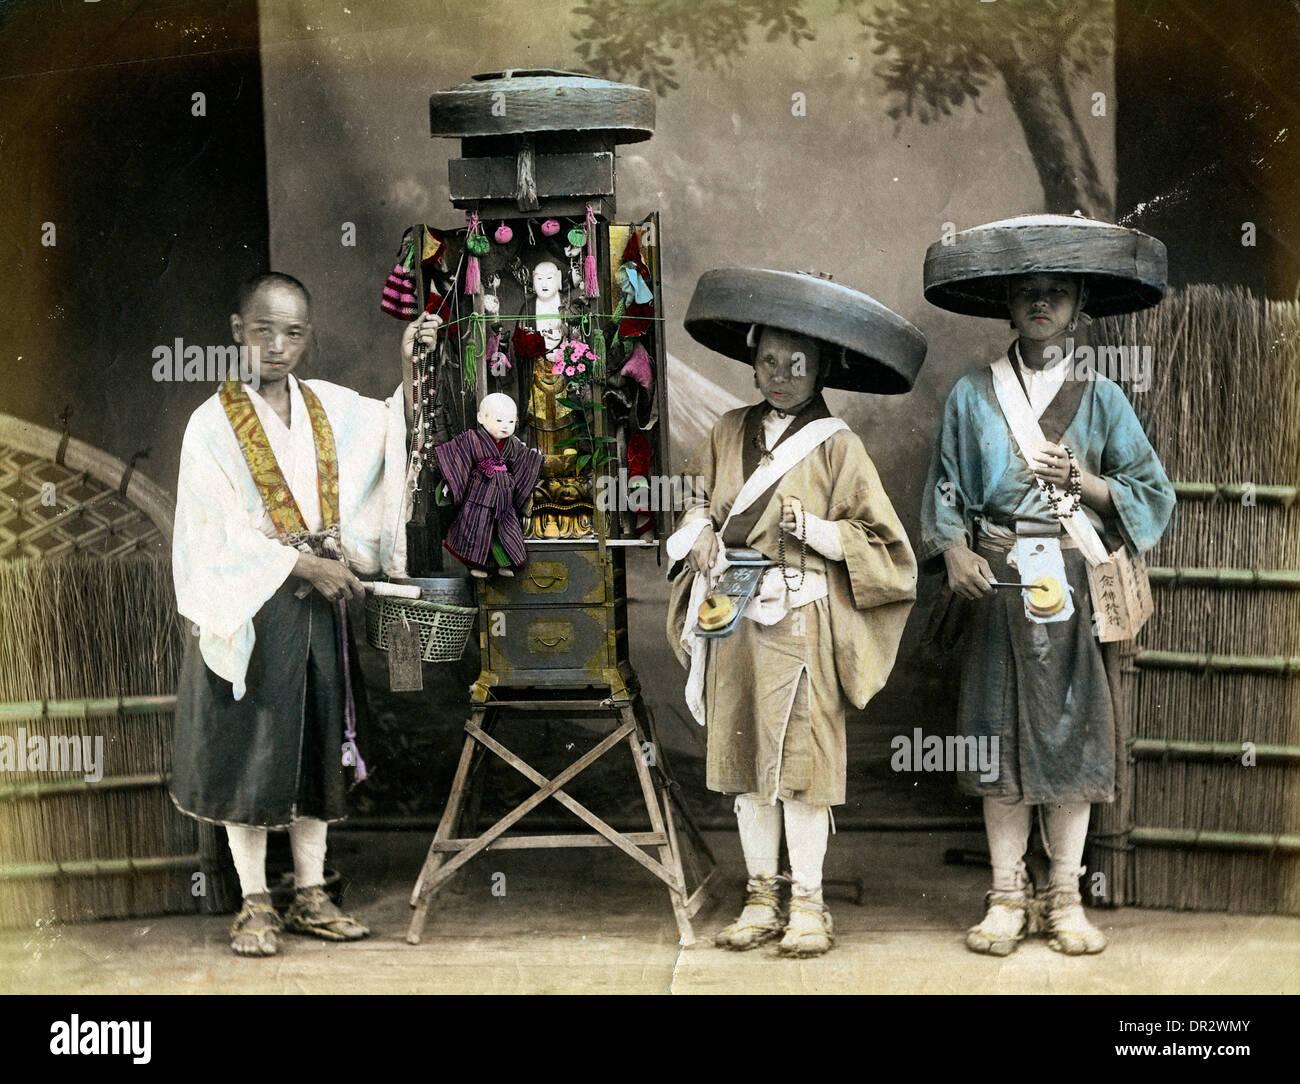 Japanese pilgrims - Stock Image